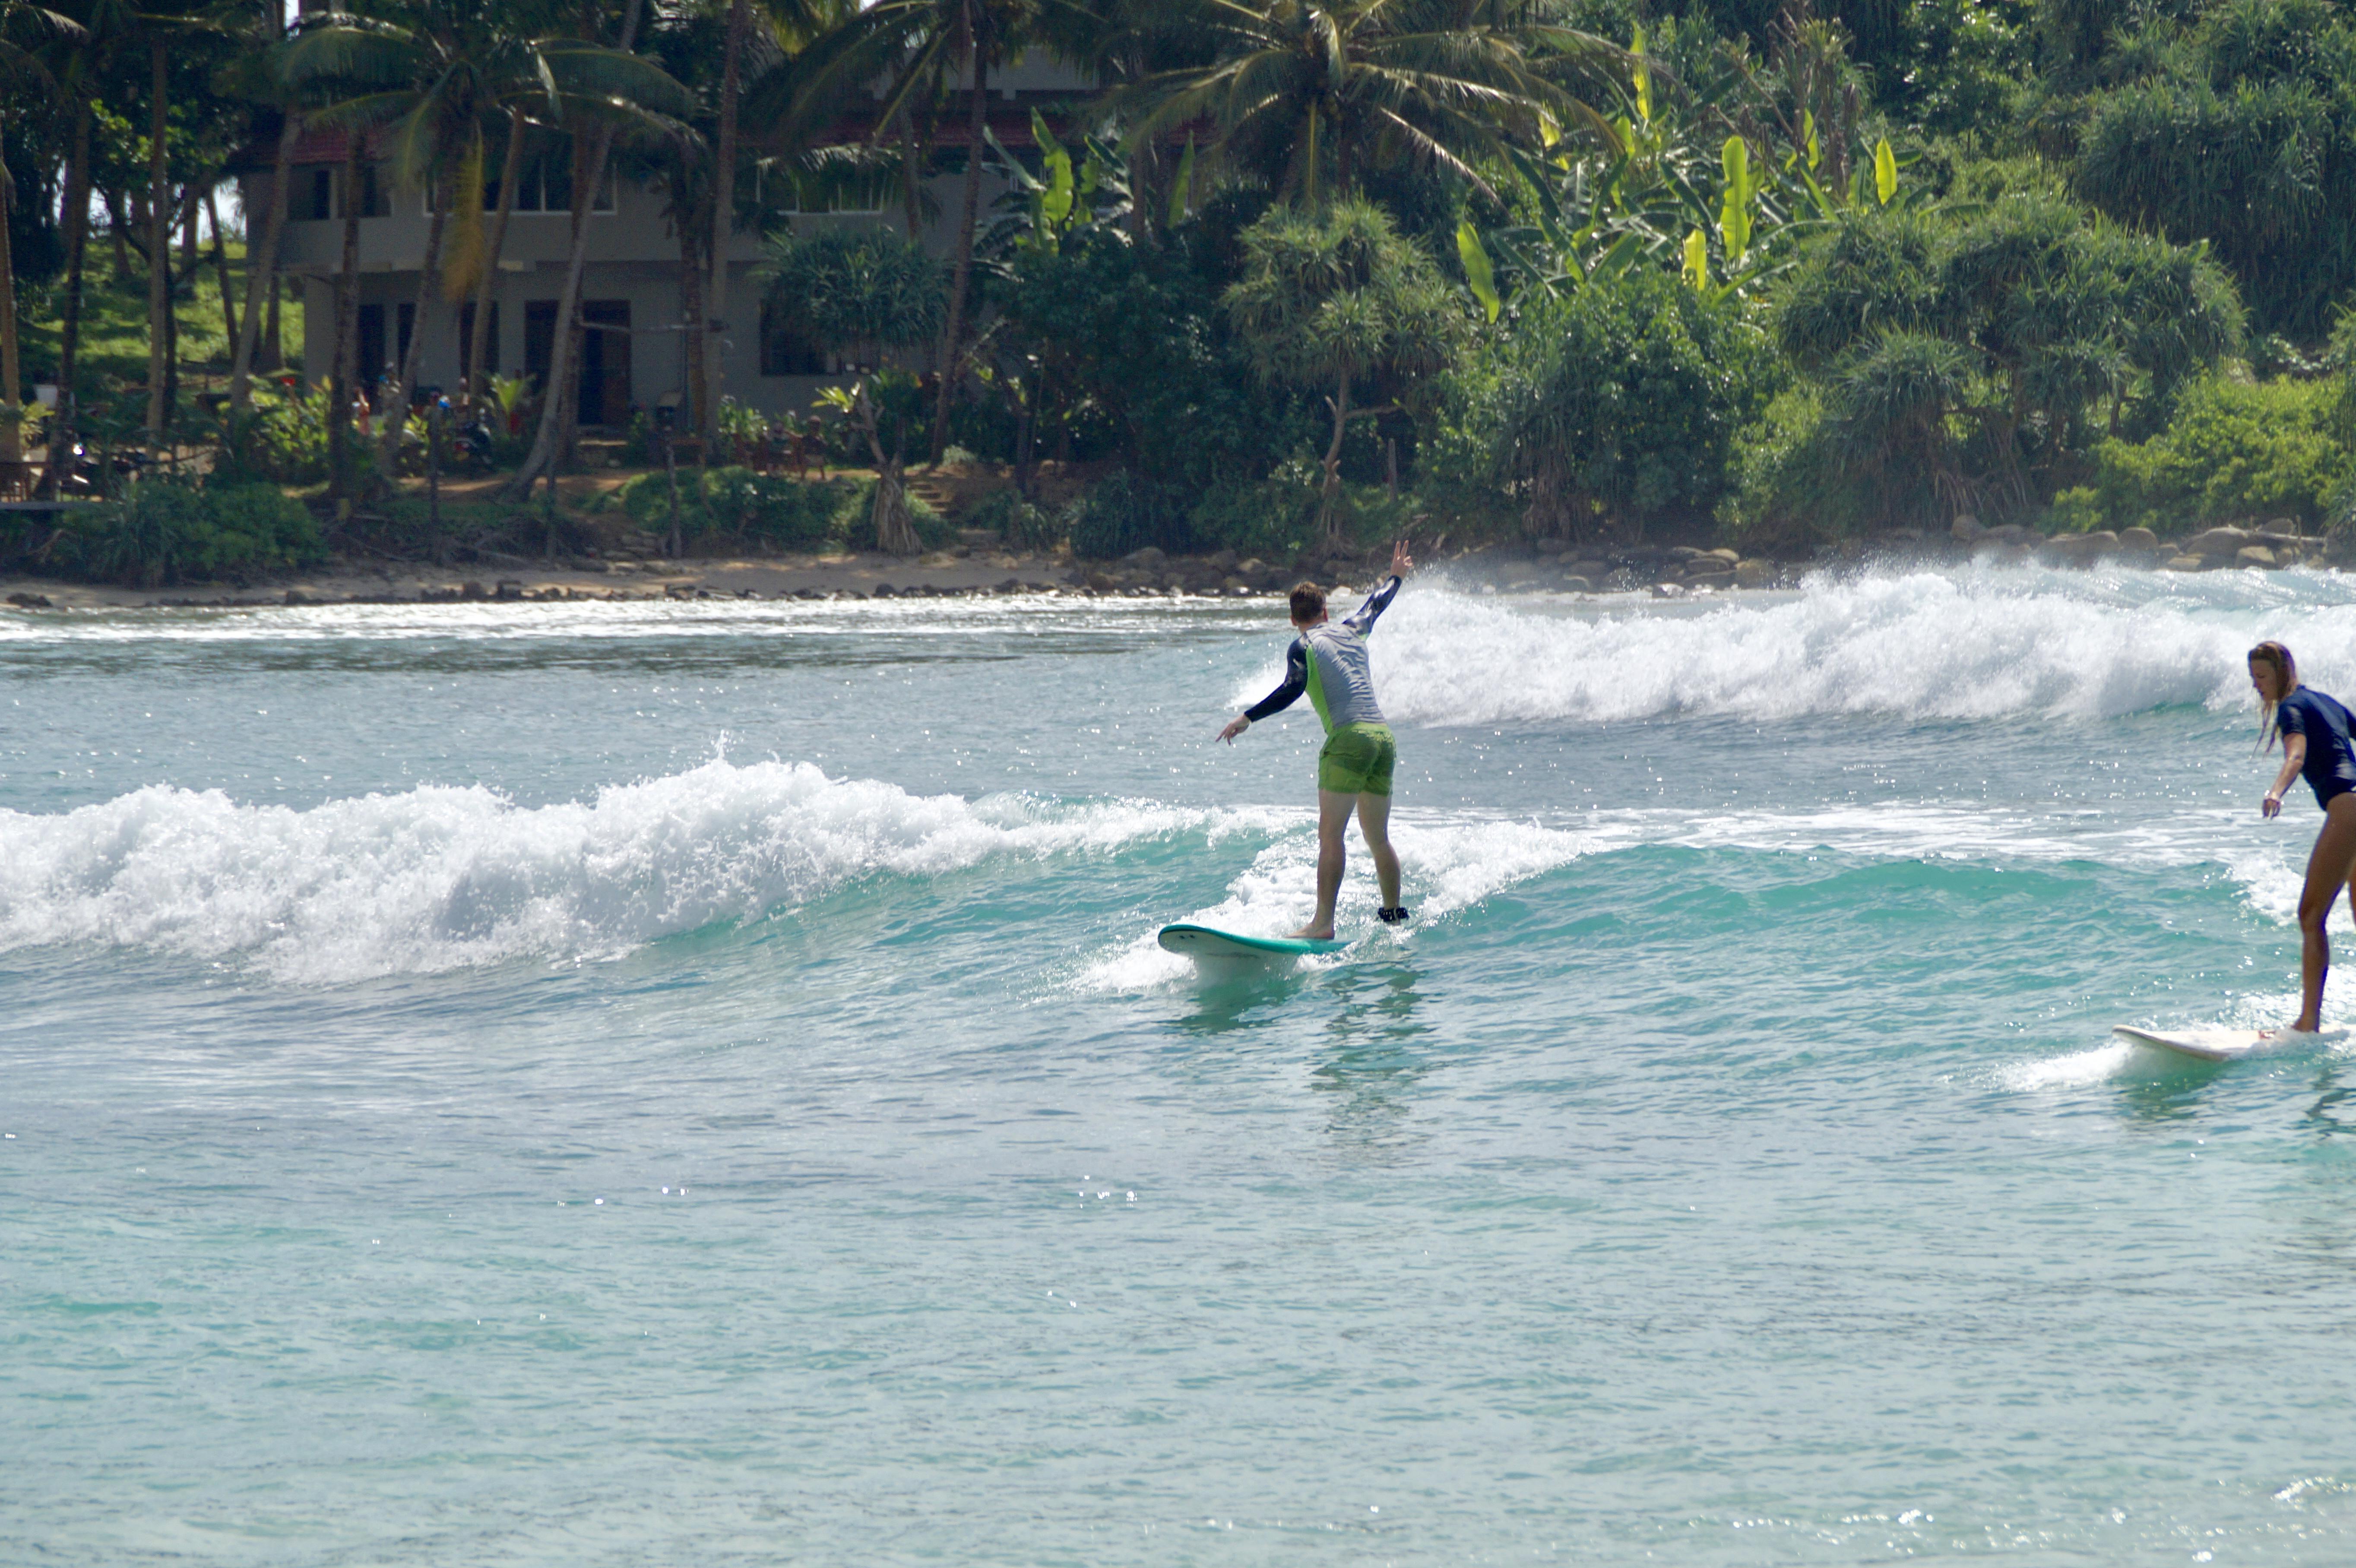 surff